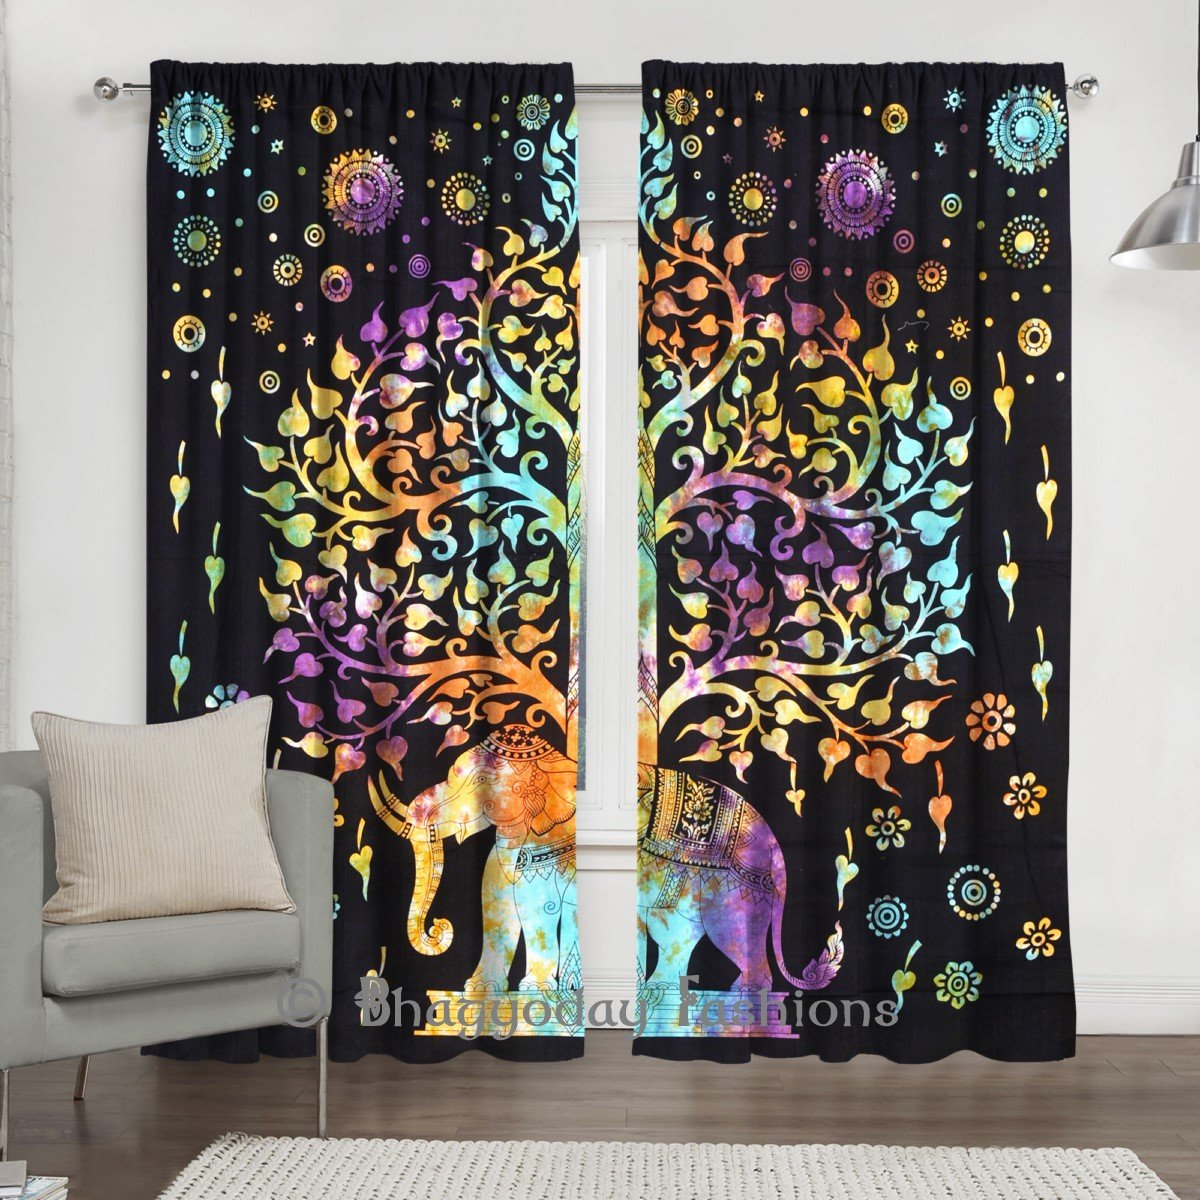 Indian Tie Dye Tree of Life Tapestry, Mandala Window Curtain Valances Room Divider 2 Pc Panel Set 84 x 80 Shree Jinvaram JWH002